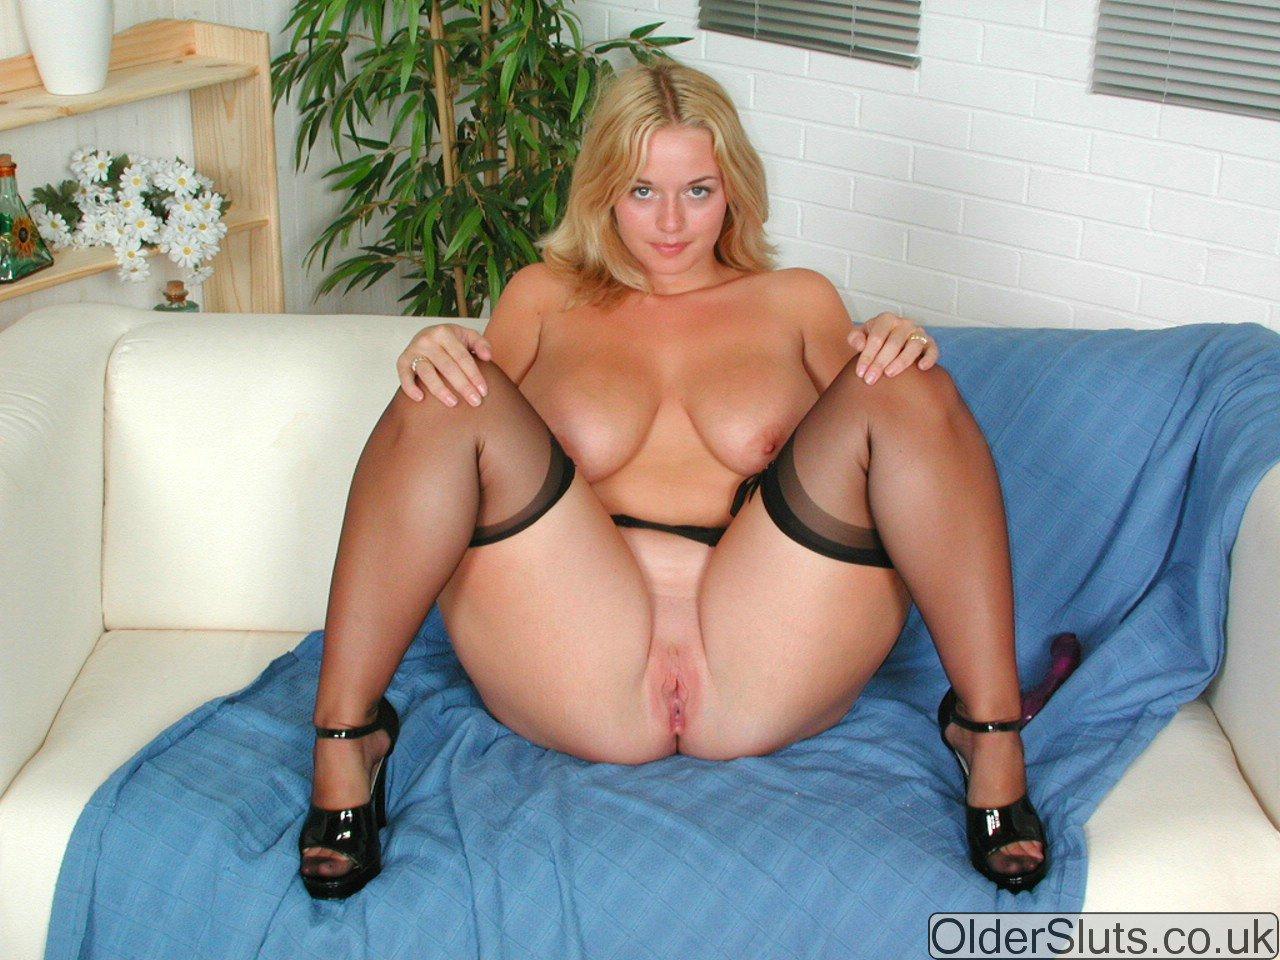 Erica mena nude pics free